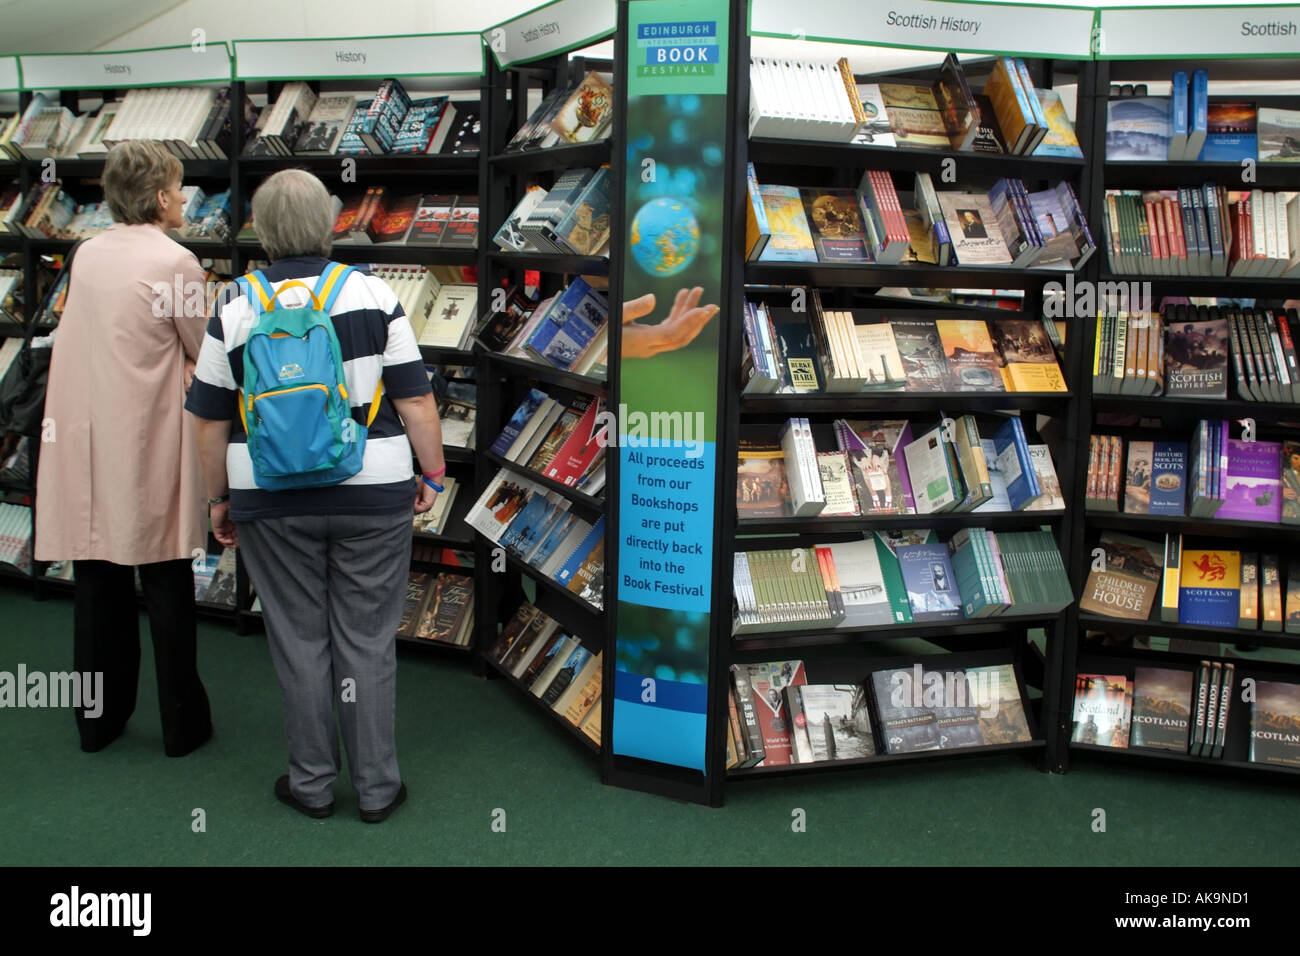 Edinburgh International Book Festival Scotland UK European viewing collection - Stock Image